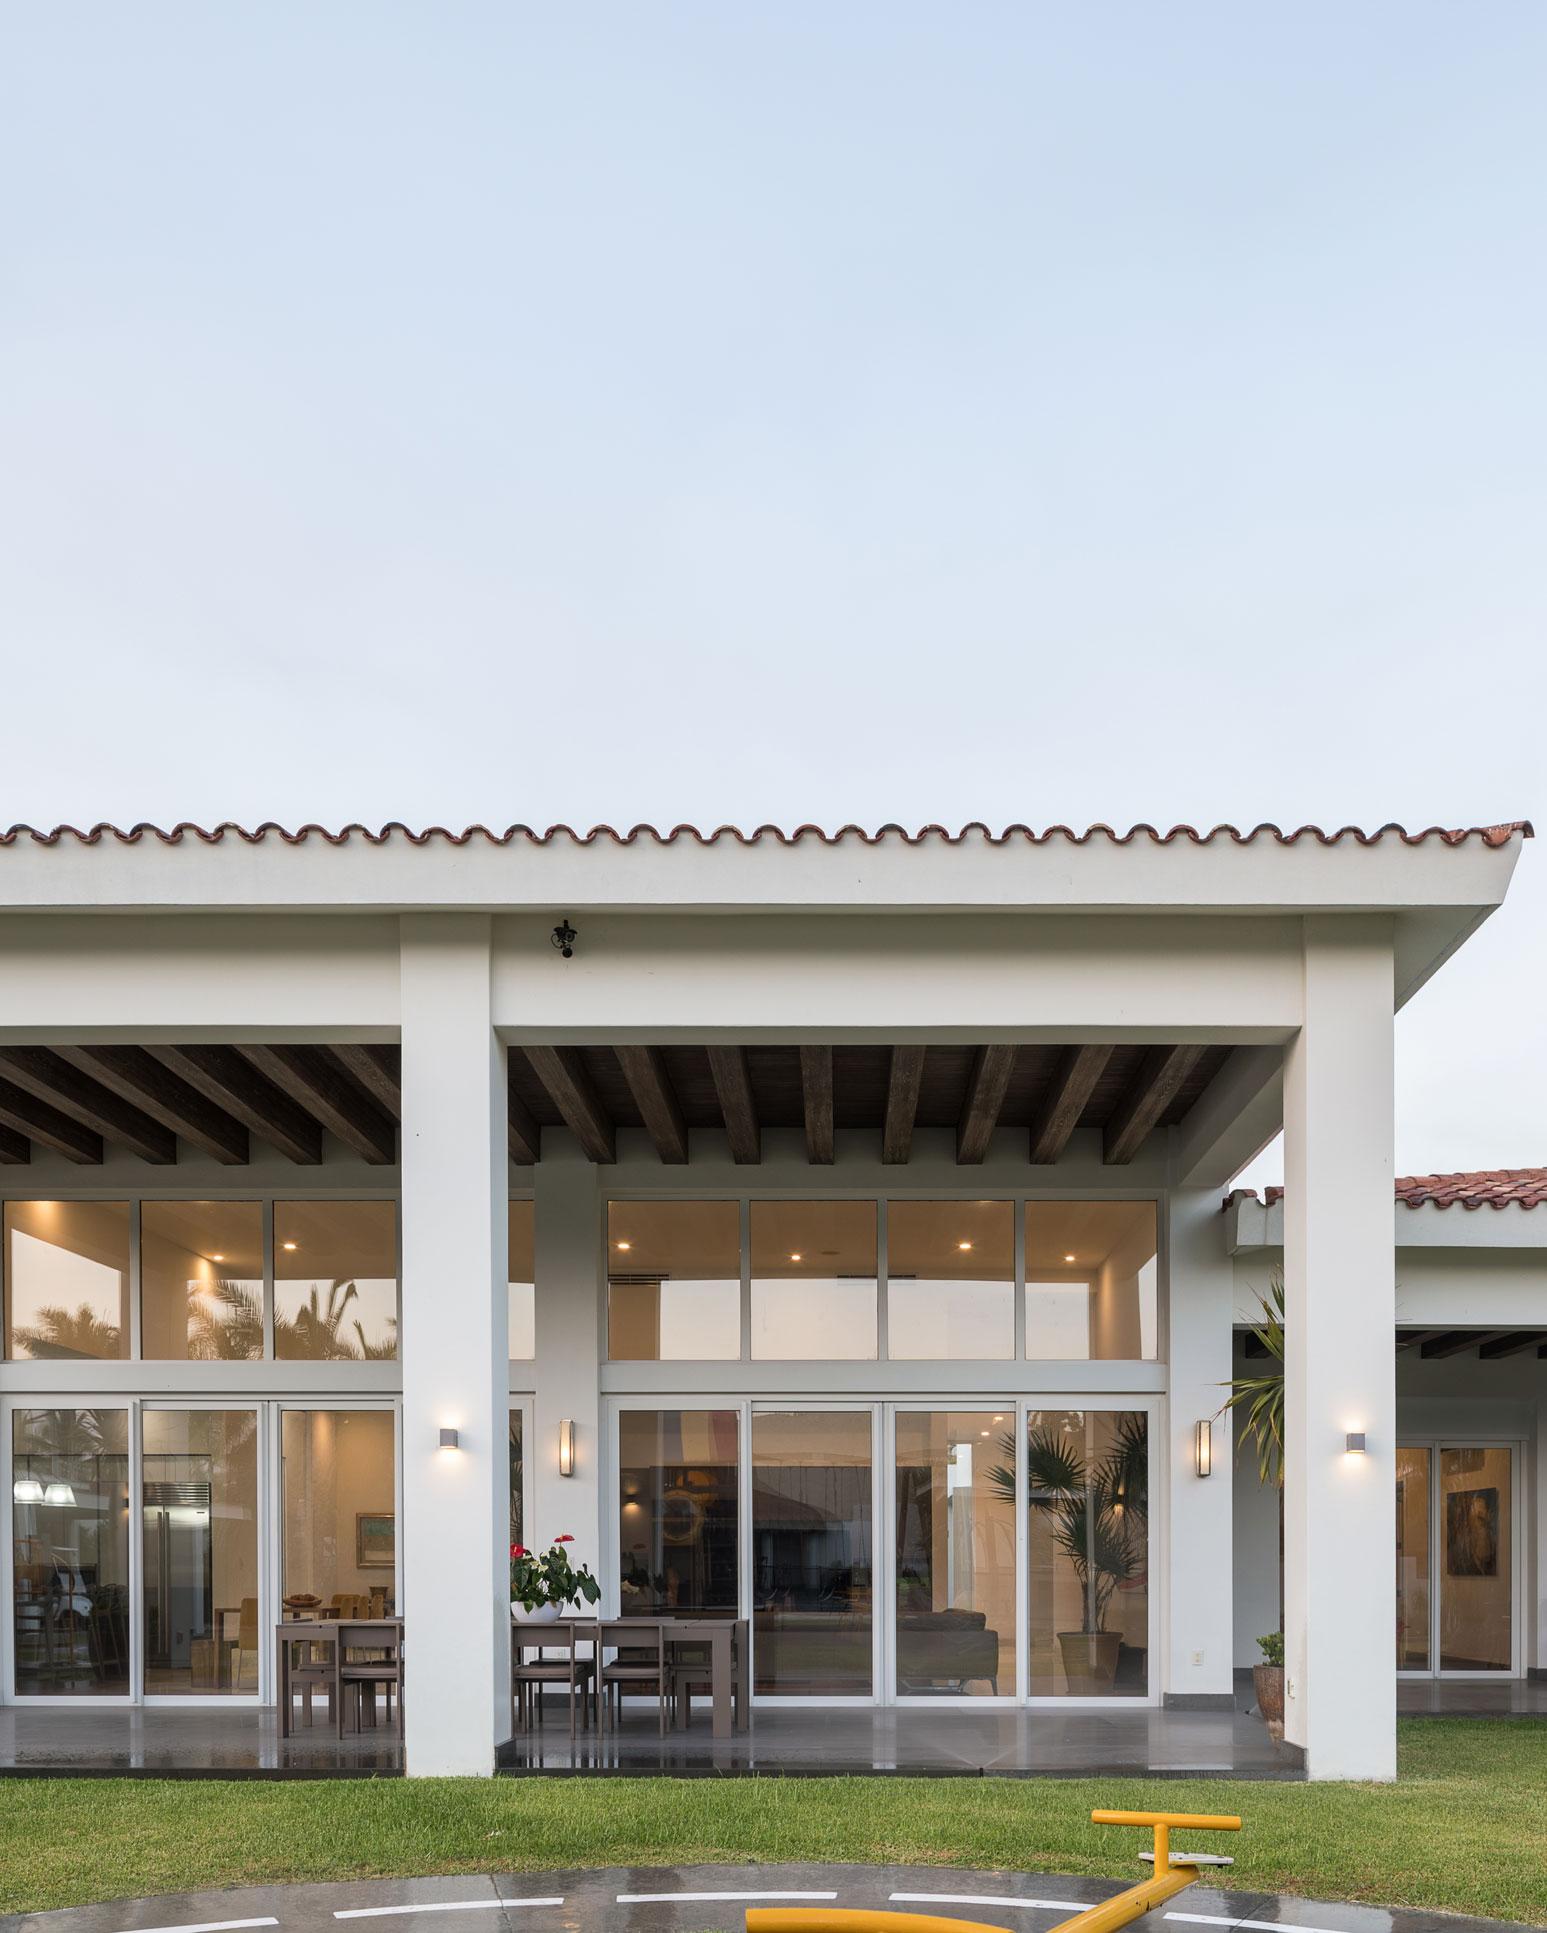 Ordaz Coppel Arquitectos-CG House-2.jpg